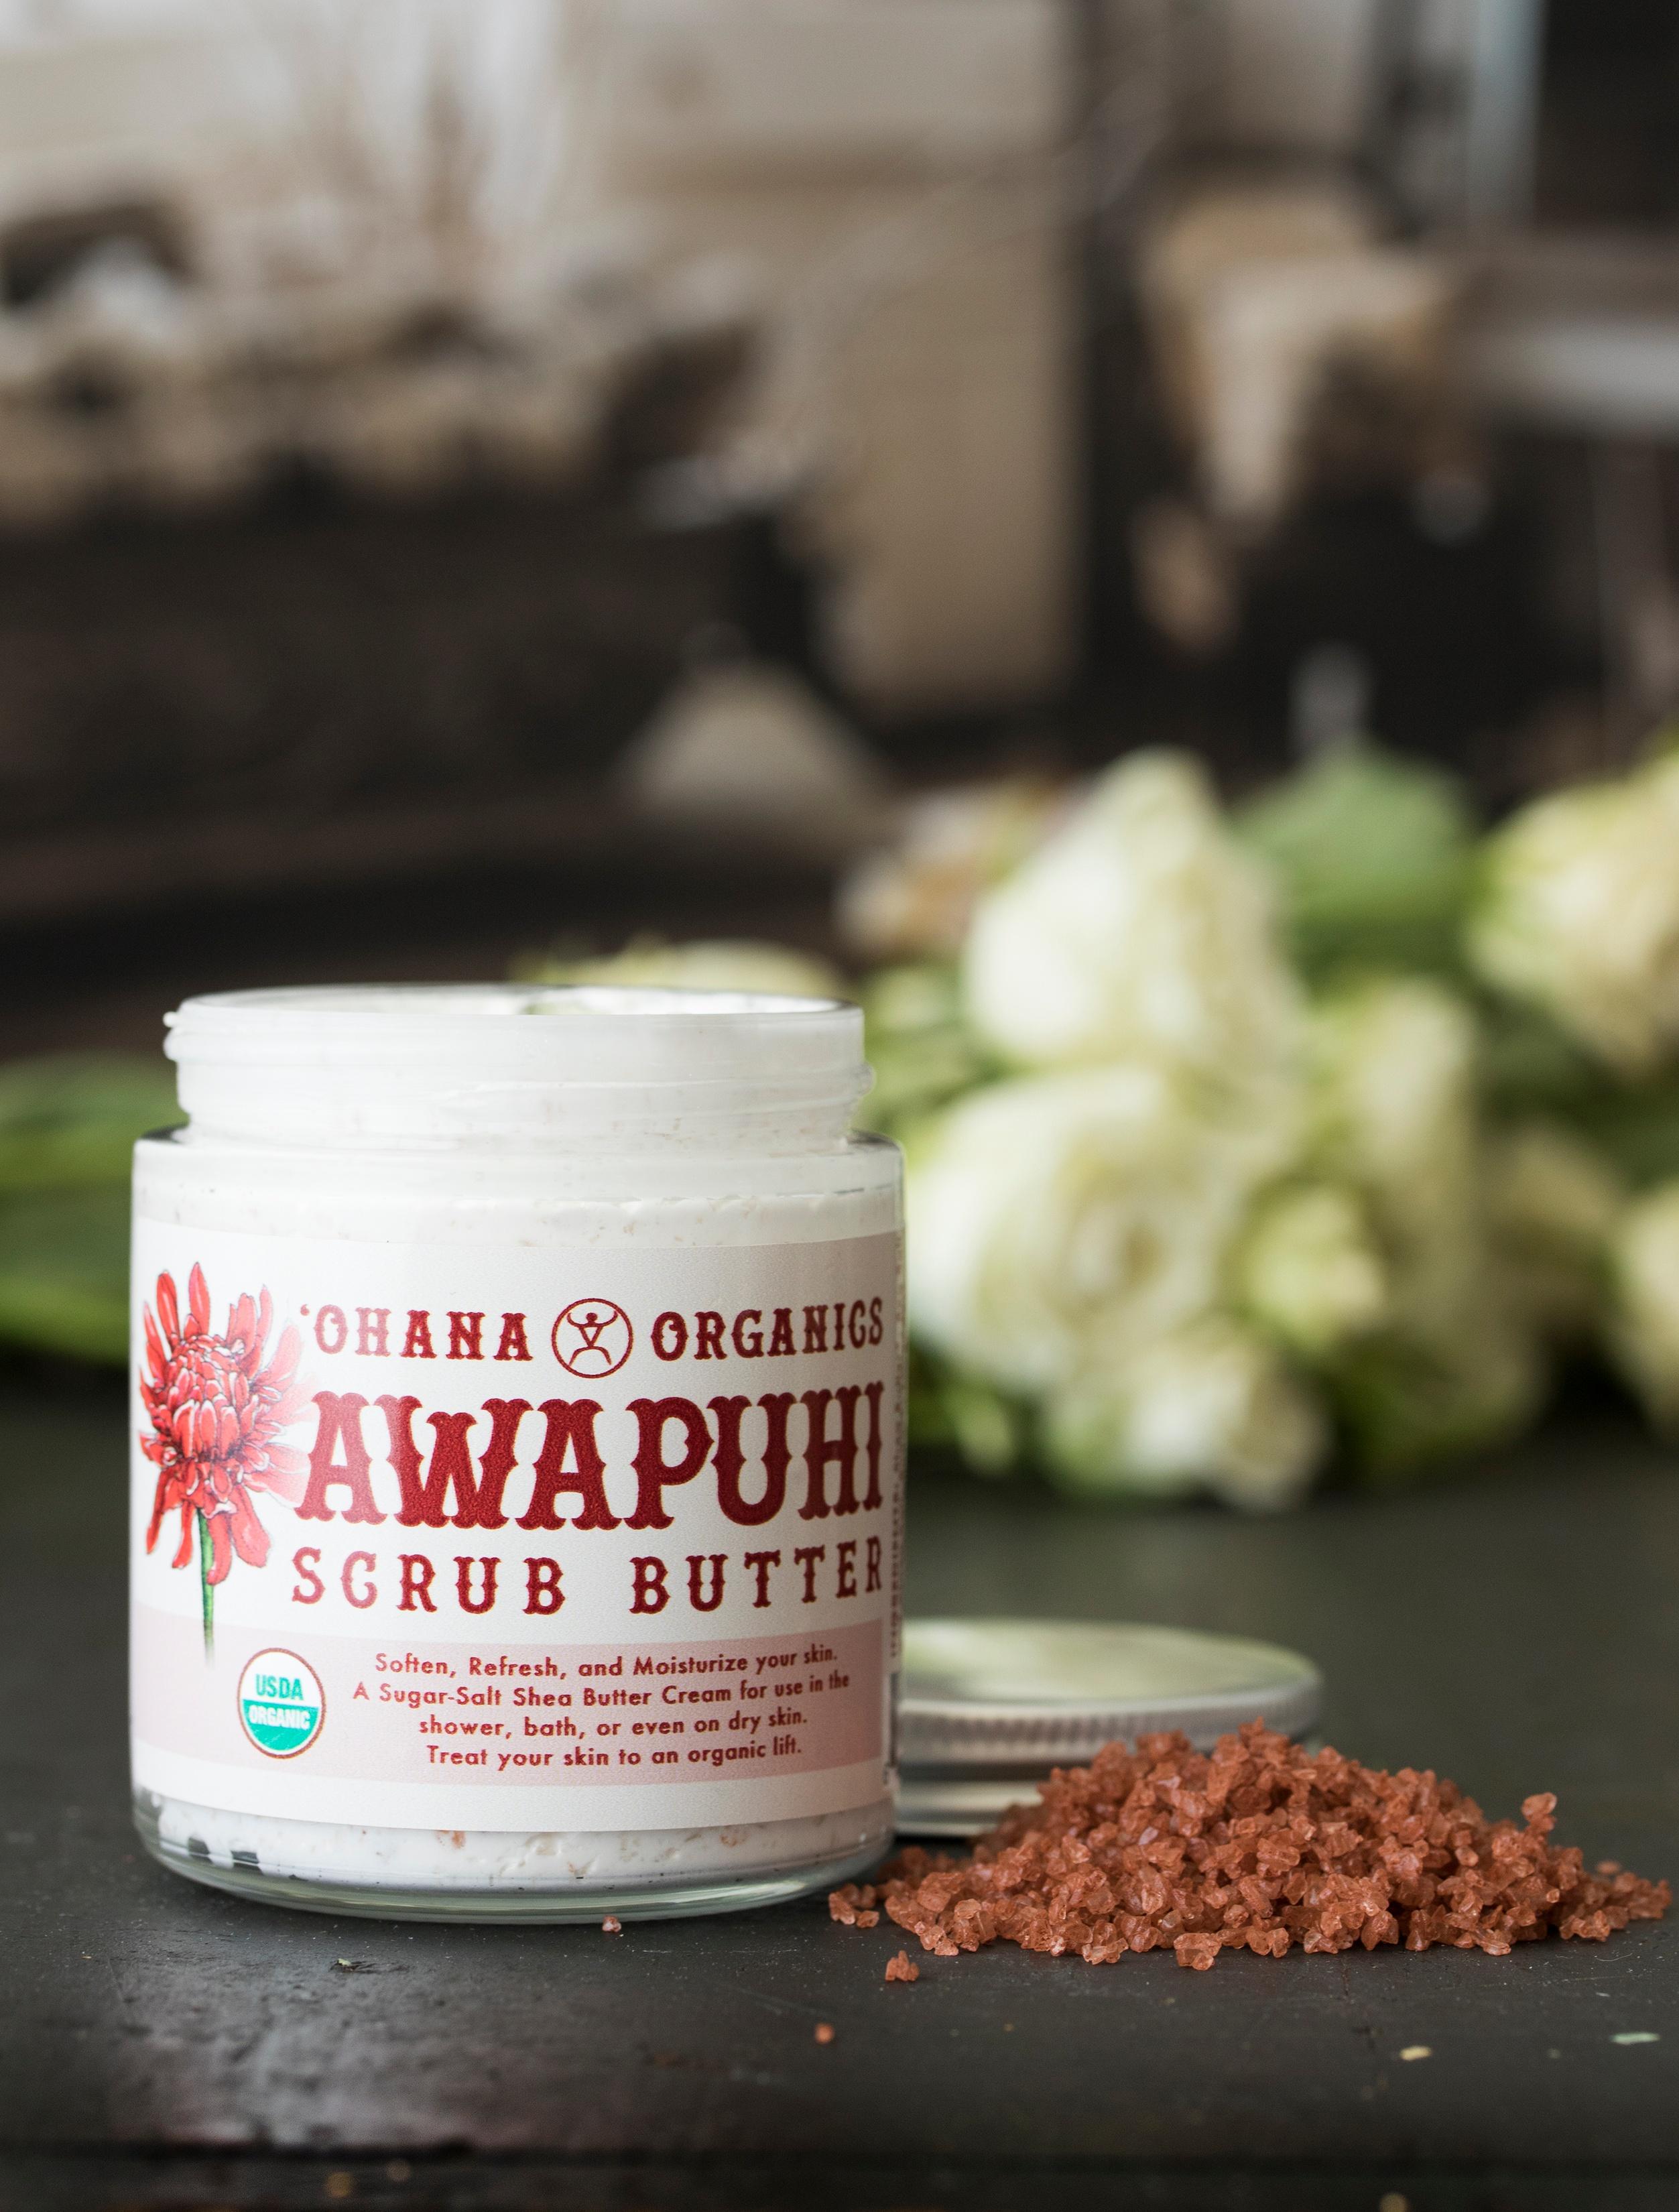 Awapuhi Scrub Butter from Ohana Organics sitting next to pile of red alea salt